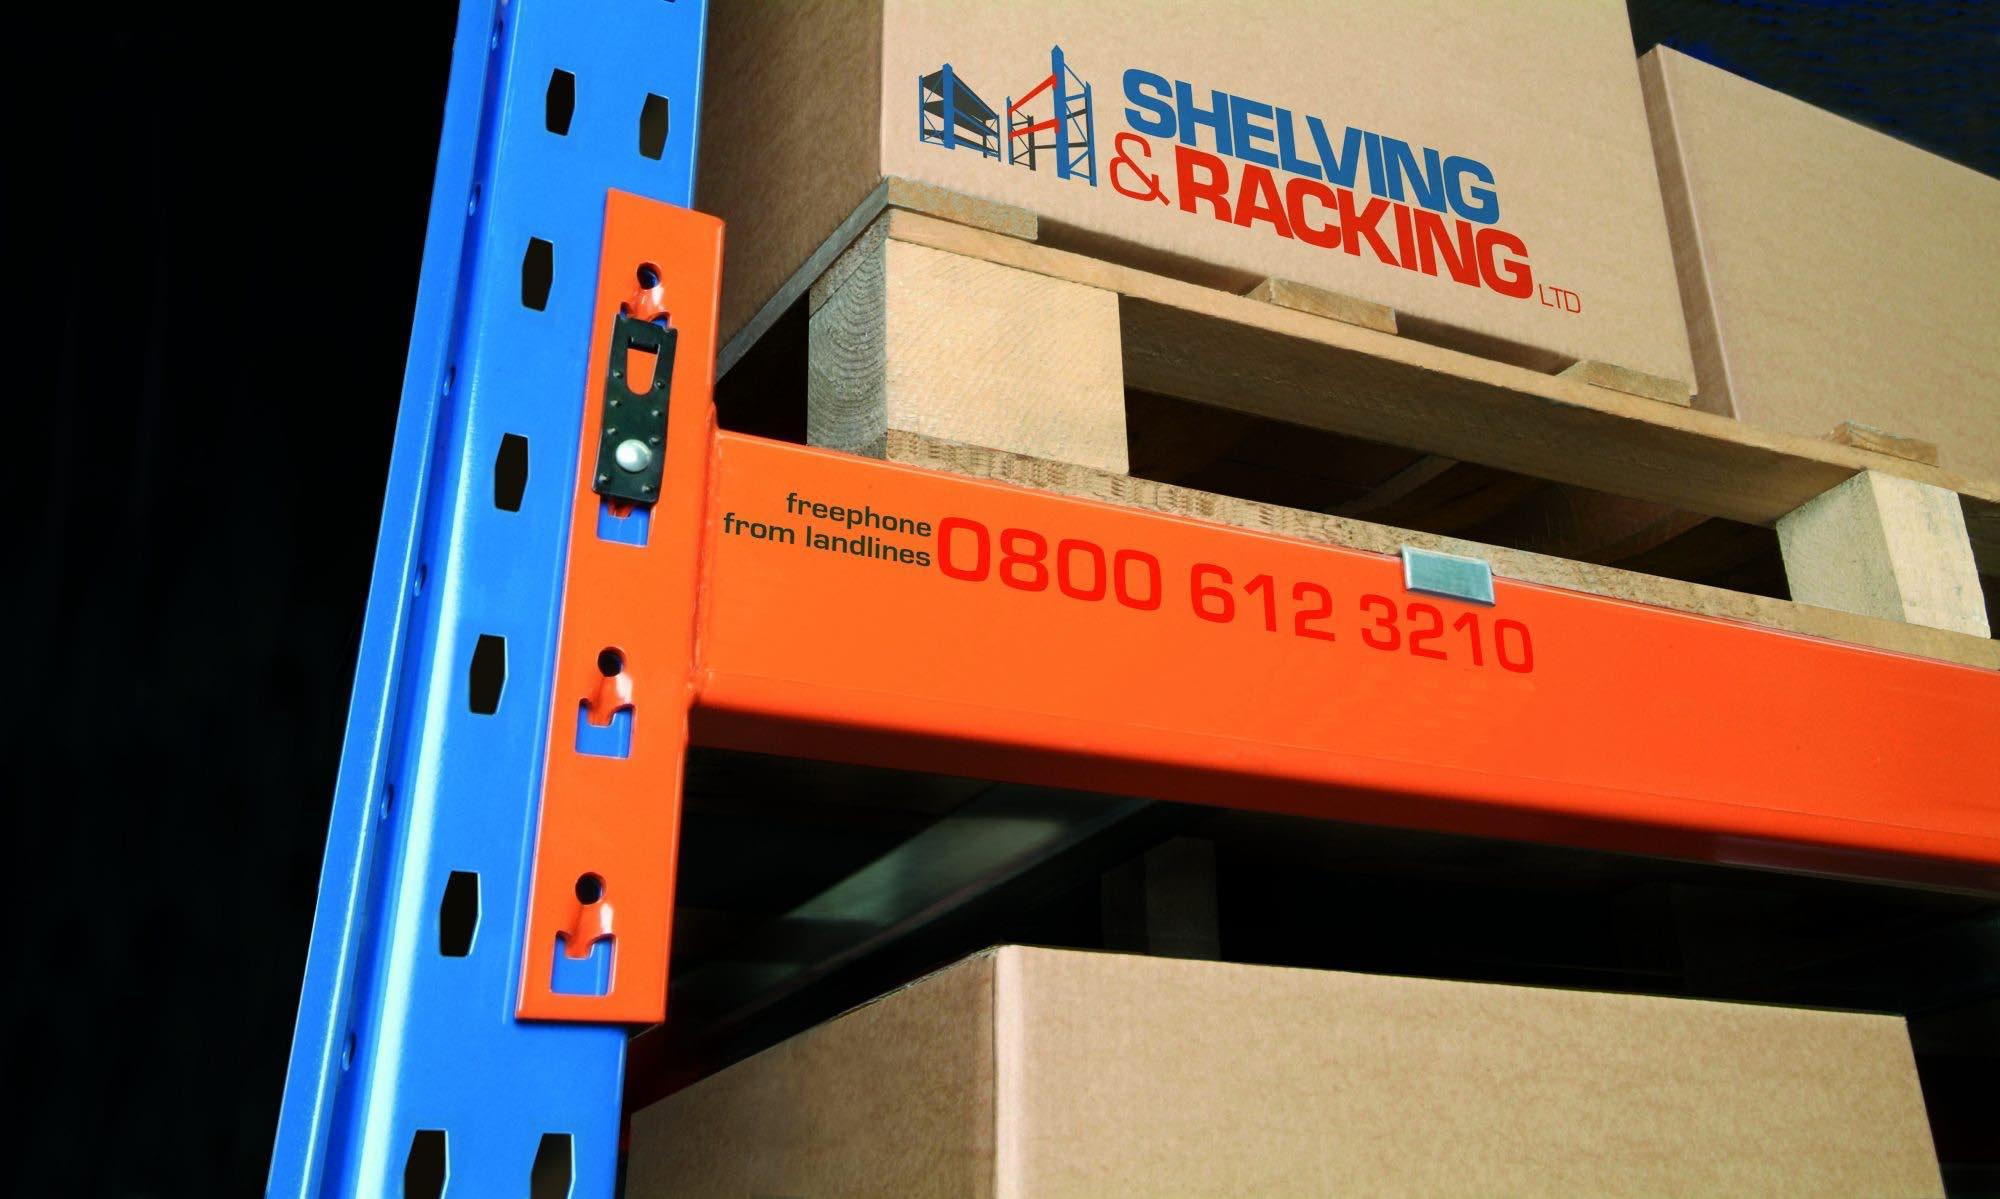 U.S.E. Shelving & Racking